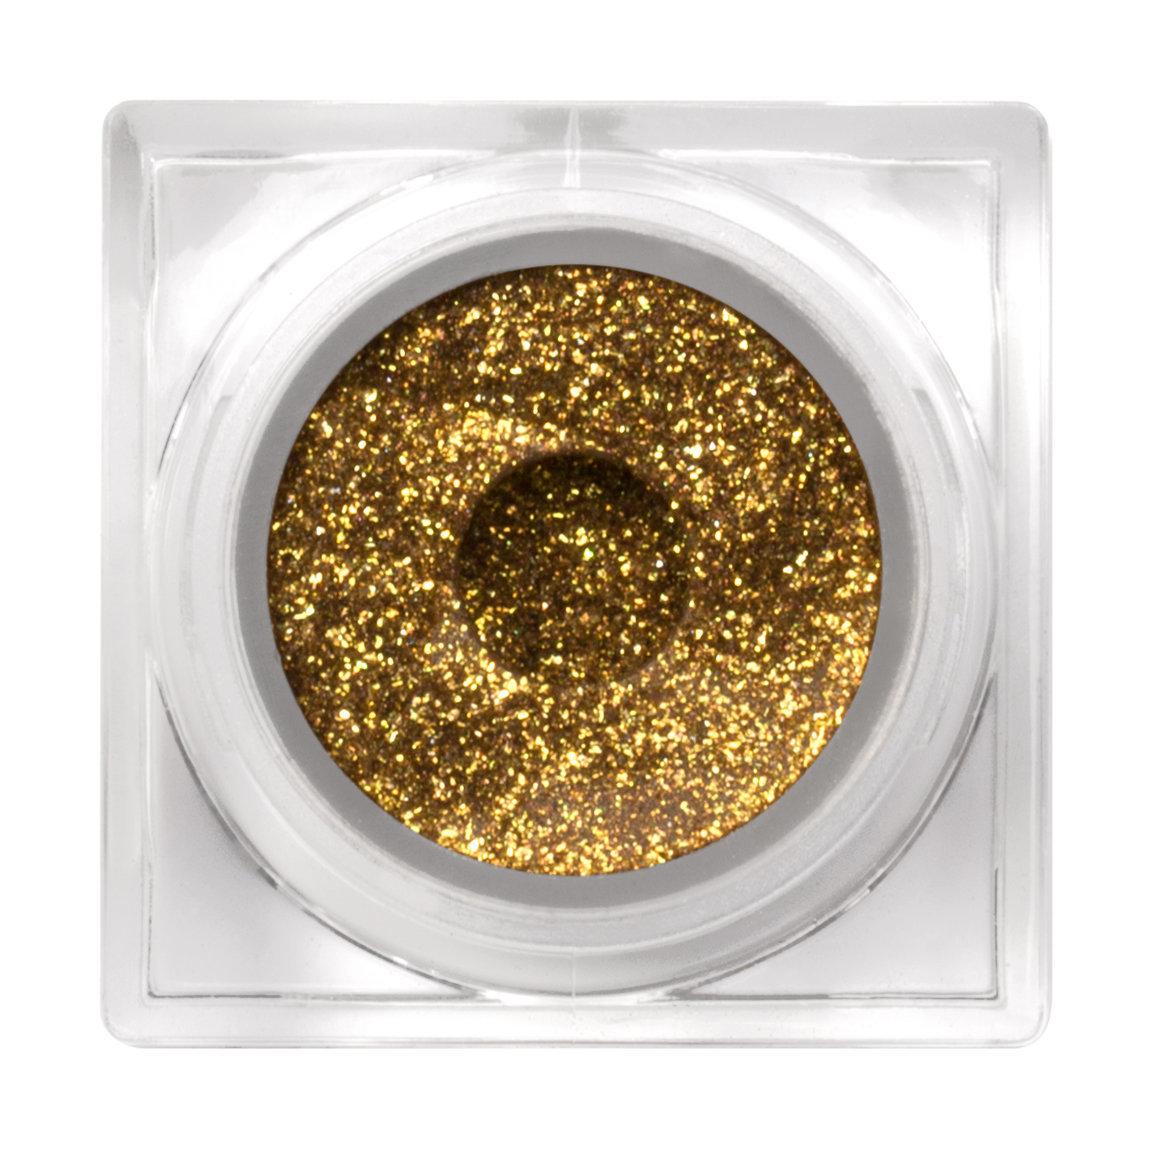 Lit Cosmetics Lit Metals Crave (Gold) alternative view 1 - product swatch.